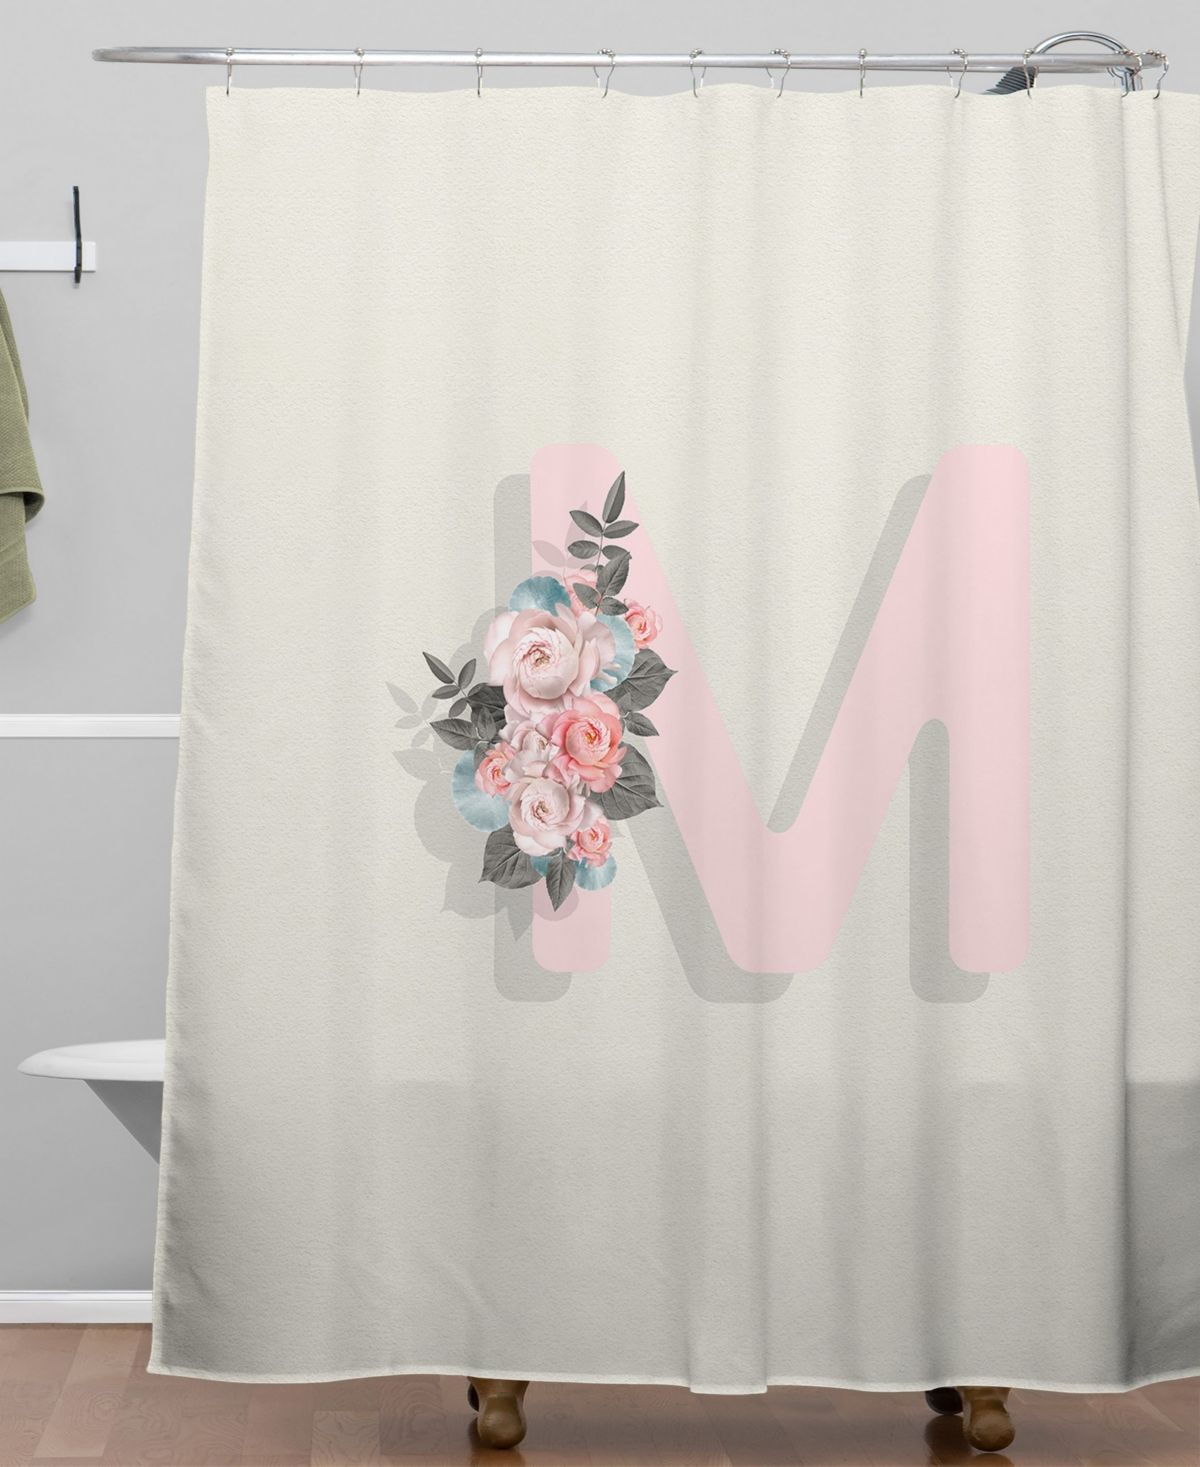 Deny Designs Iveta Abolina Pivoine M Shower Curtain Reviews Shower Curtains Bed Bath Macy S Design Baby Clothes Shops Curtains